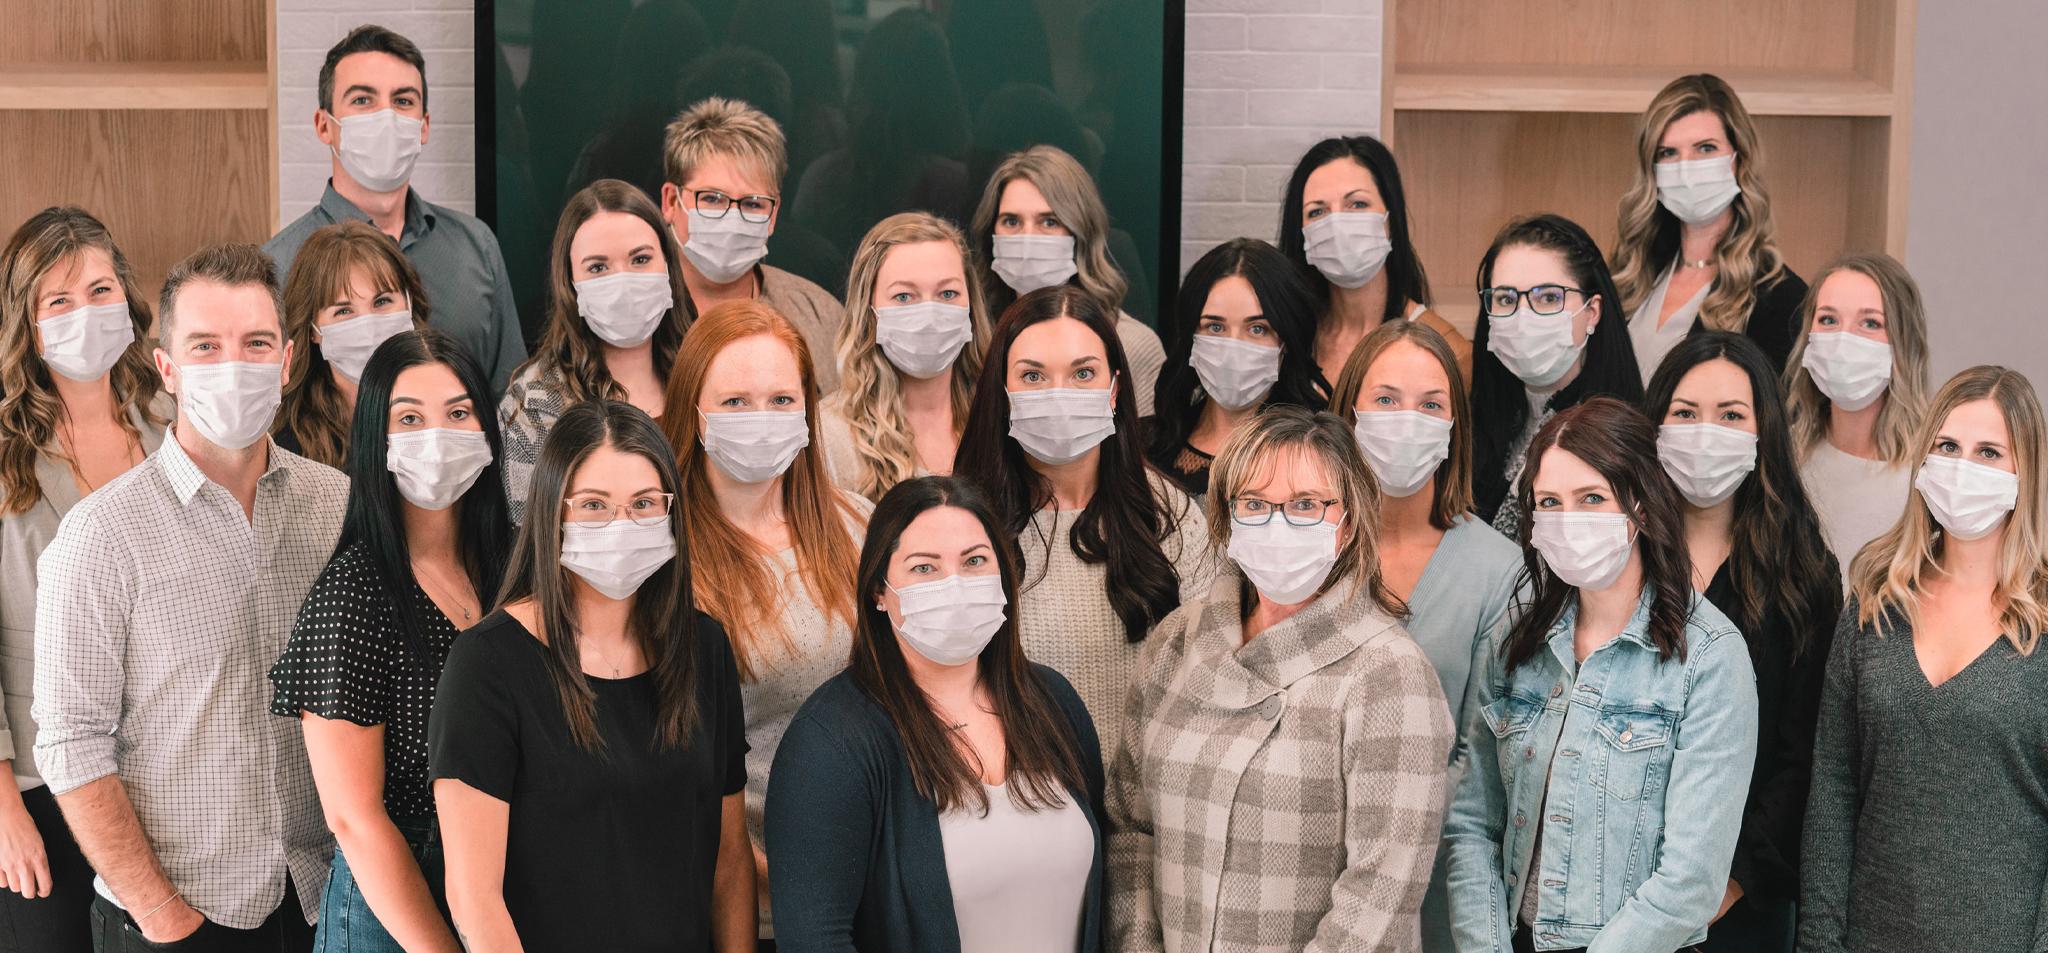 dentist office in brandon